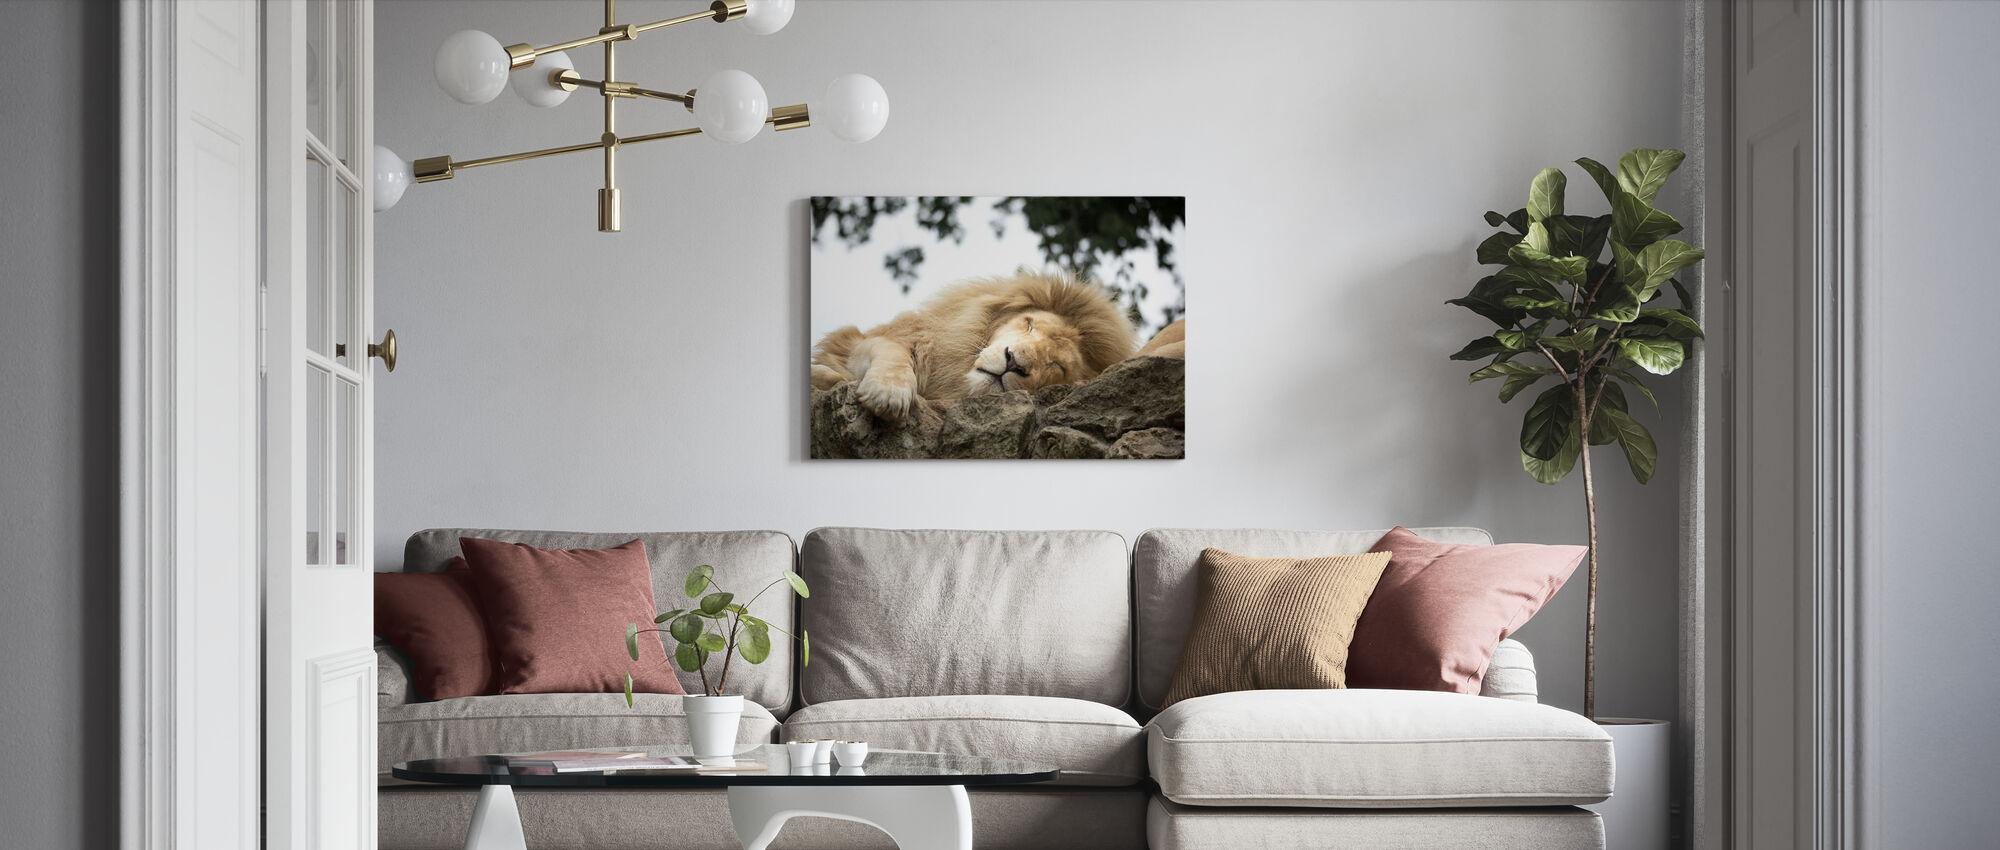 Great Mane - Canvas print - Living Room